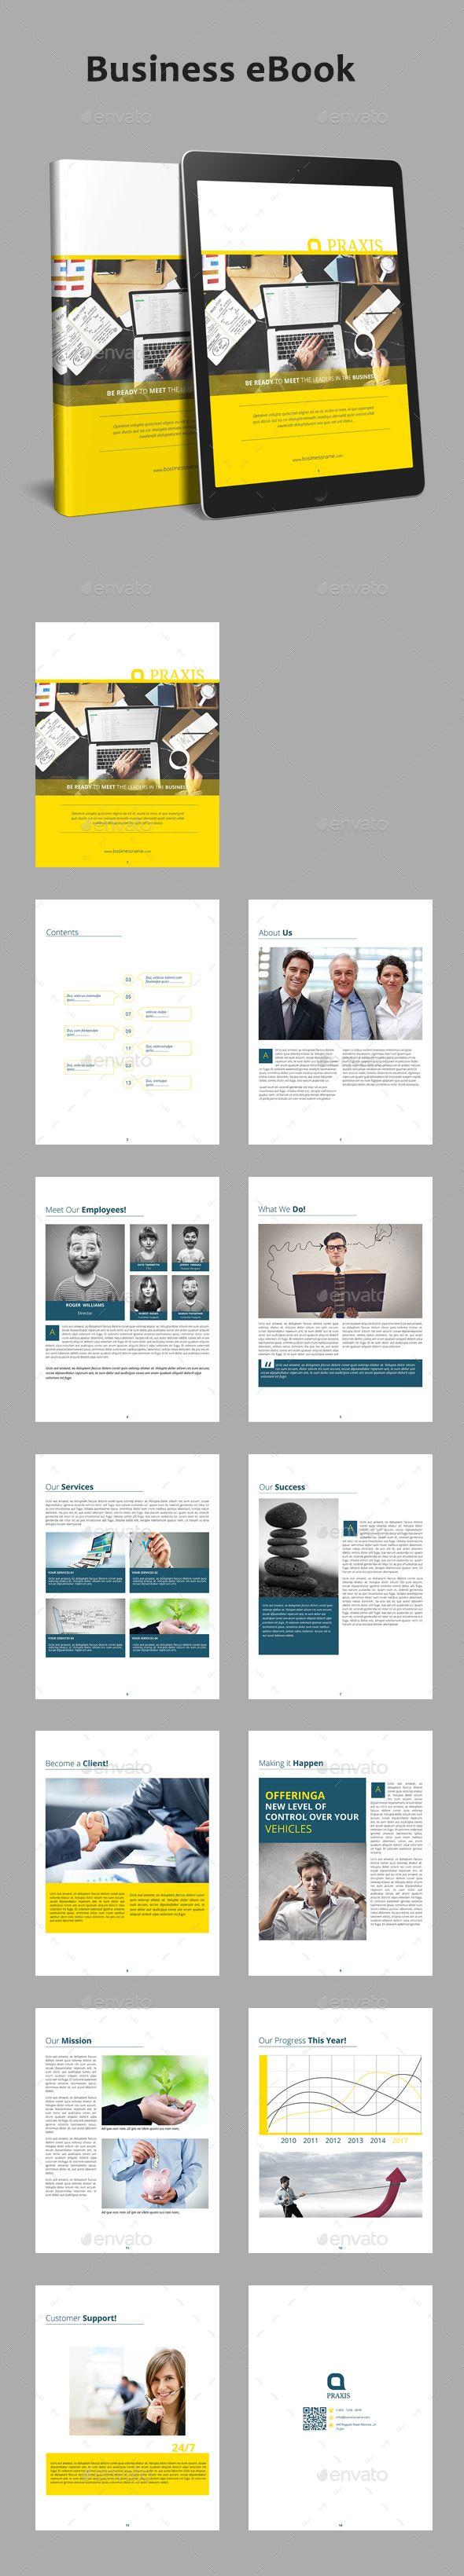 8 best EBOOK DESIGNS / DISEÑOS PARA EBOOKS images on Pinterest ...